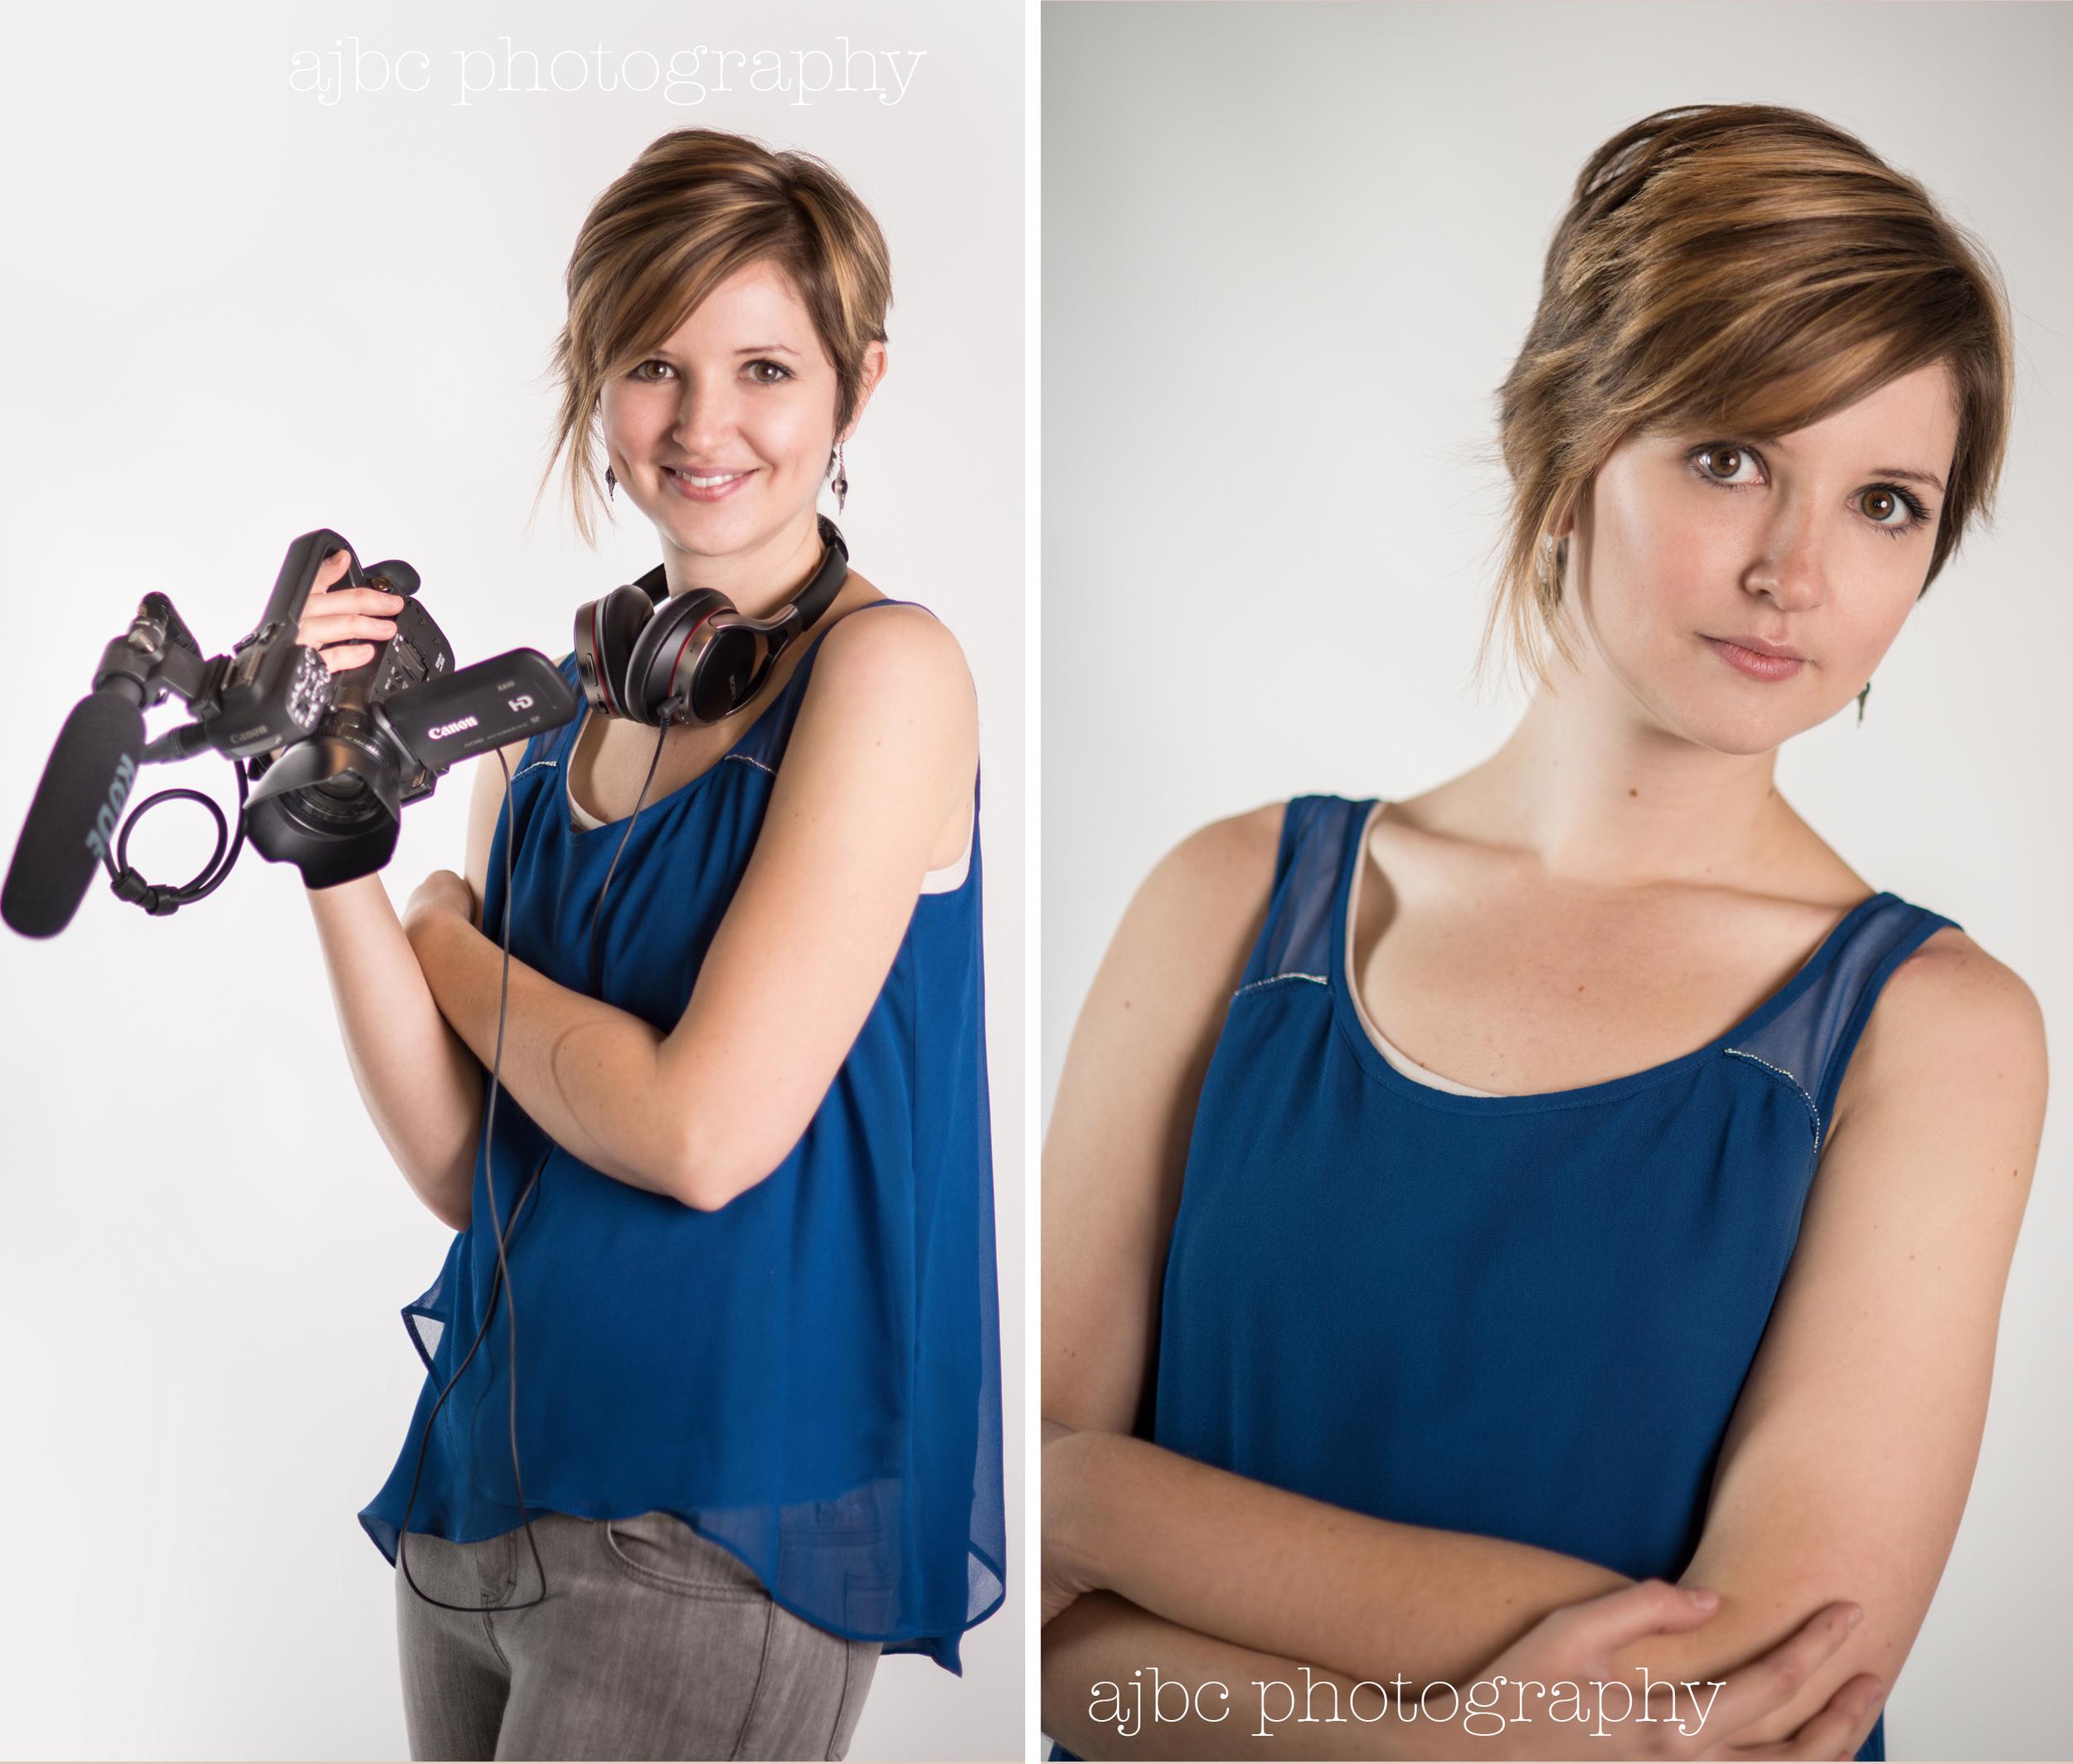 ajbcphotography-porthuron-michigan-filmmaker-headshots-australia.jpg